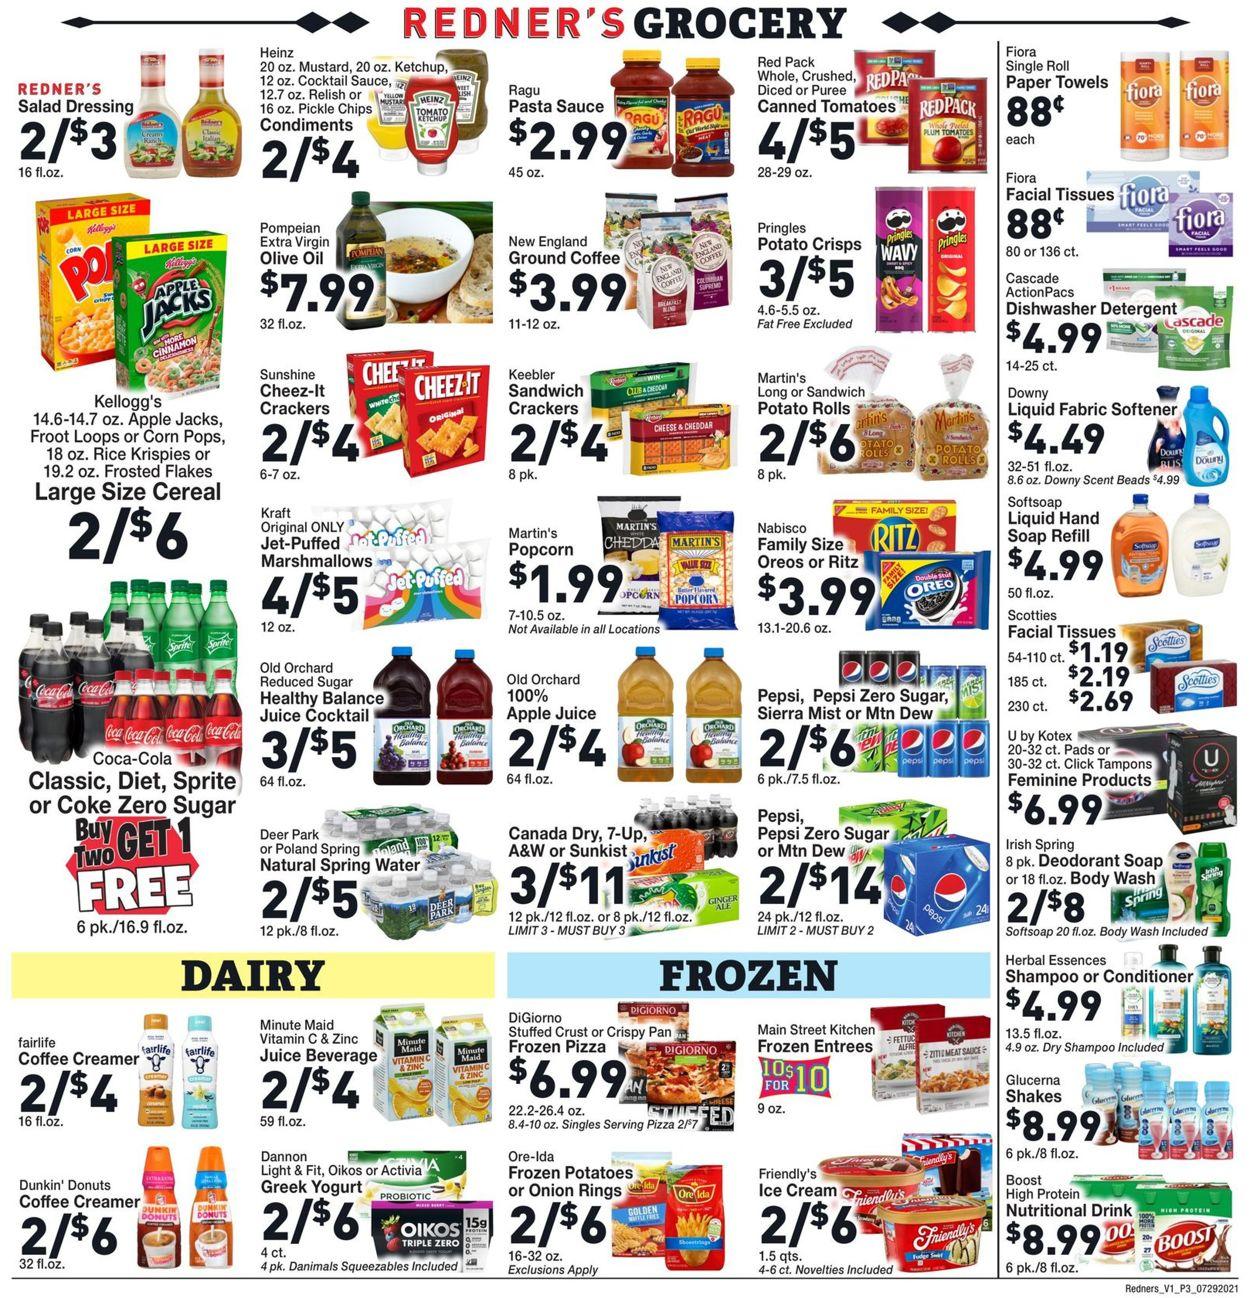 Redner's Warehouse Market Weekly Ad Circular - valid 07/29-08/04/2021 (Page 5)